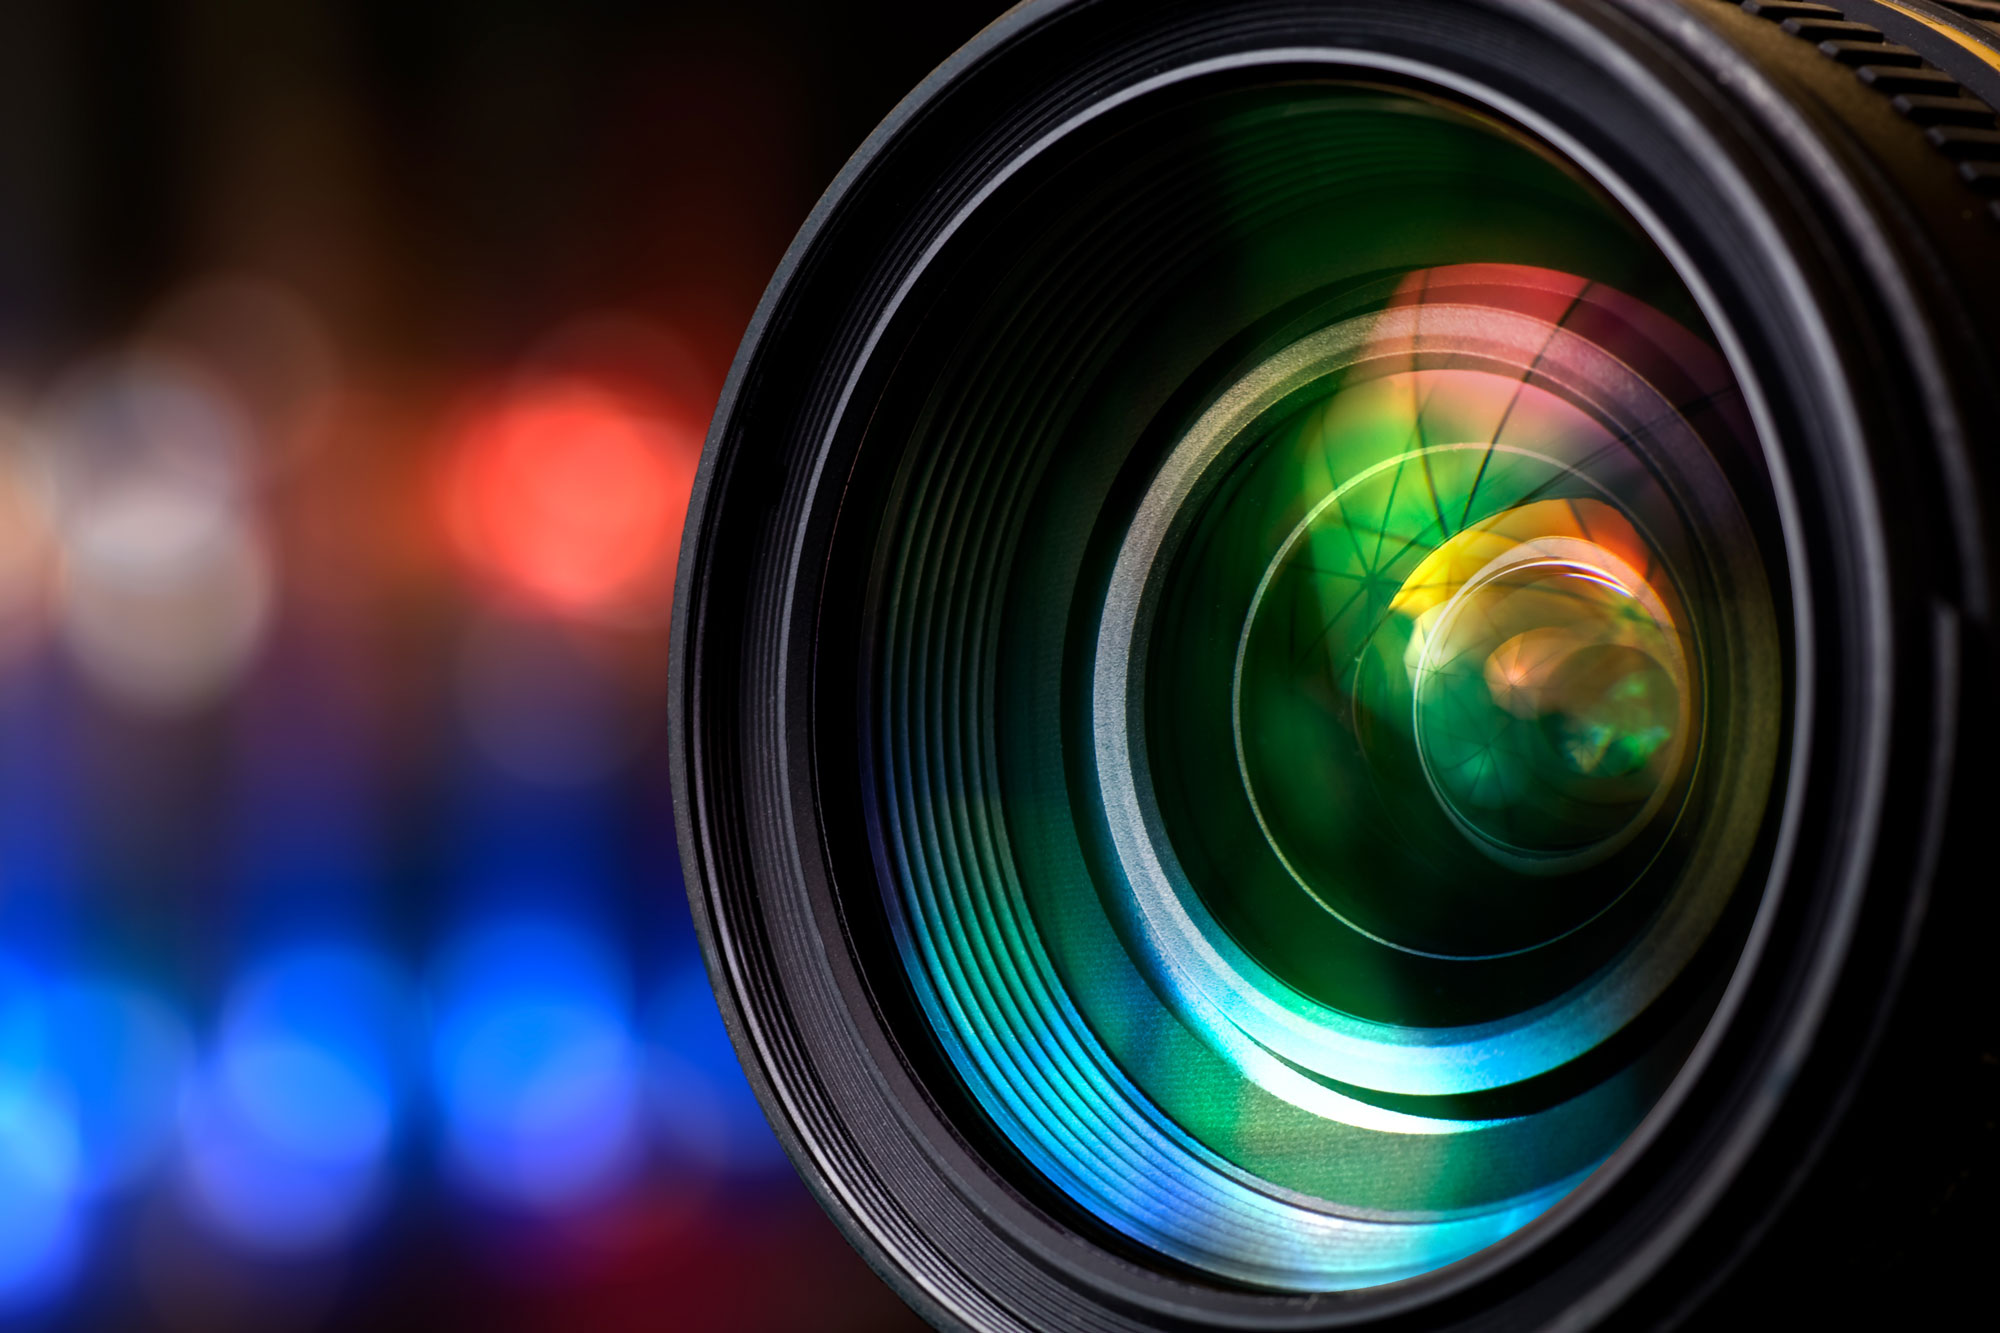 Daftar Sekolah kursus Seni Photography Di Jakarta